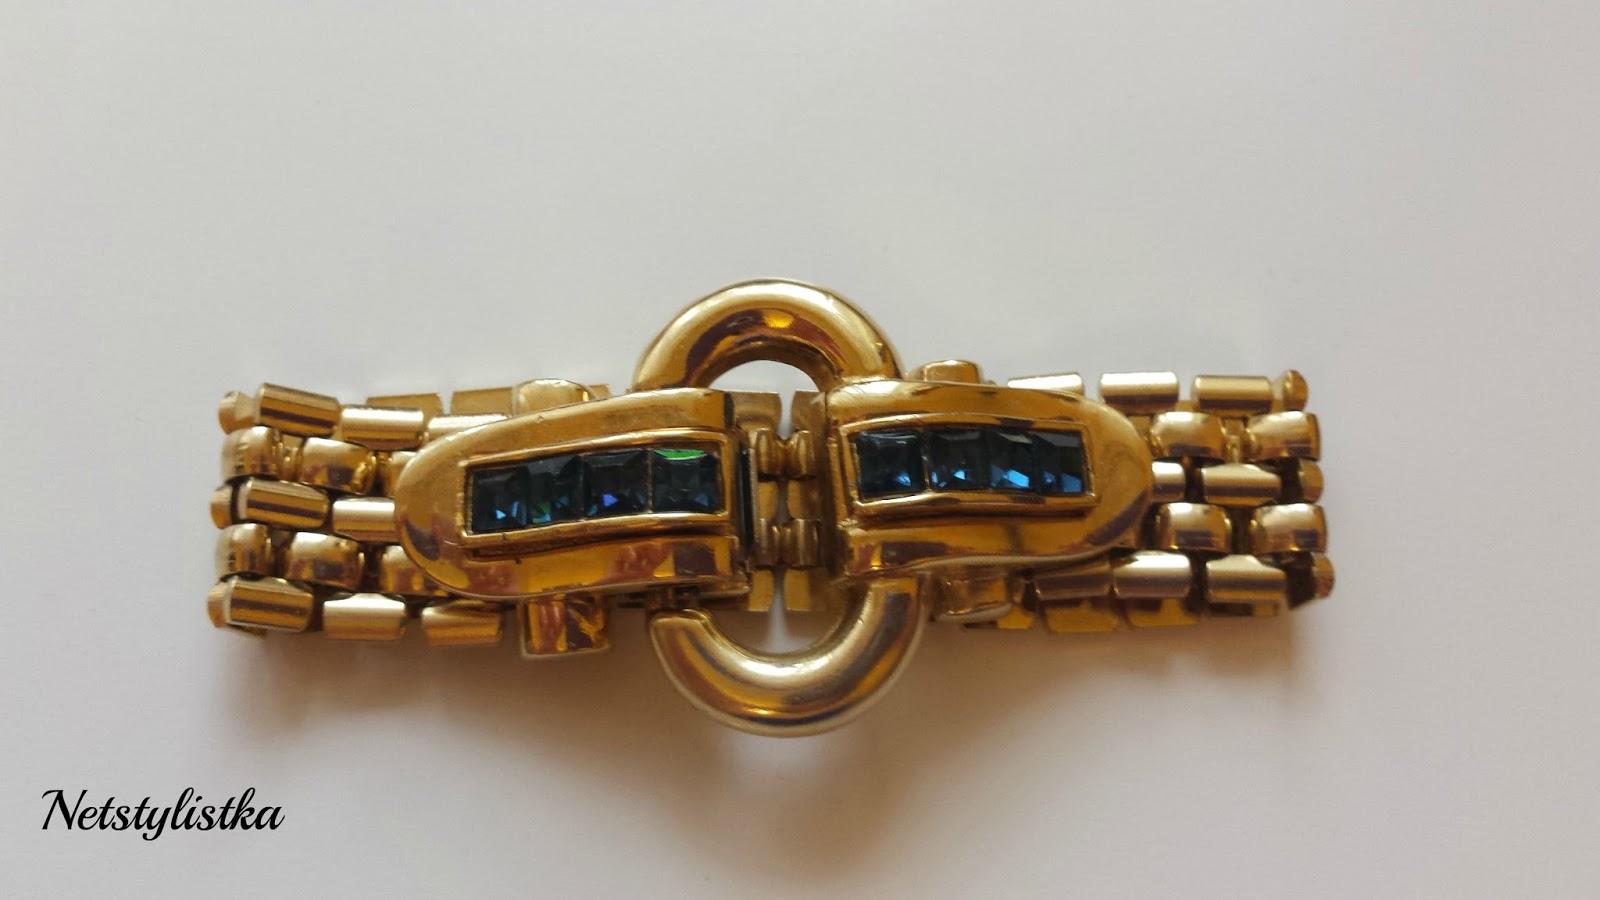 Givenchy vintage biżuteria, złota bransoletka Givenchy, gdzie kupować biżuterię vintage